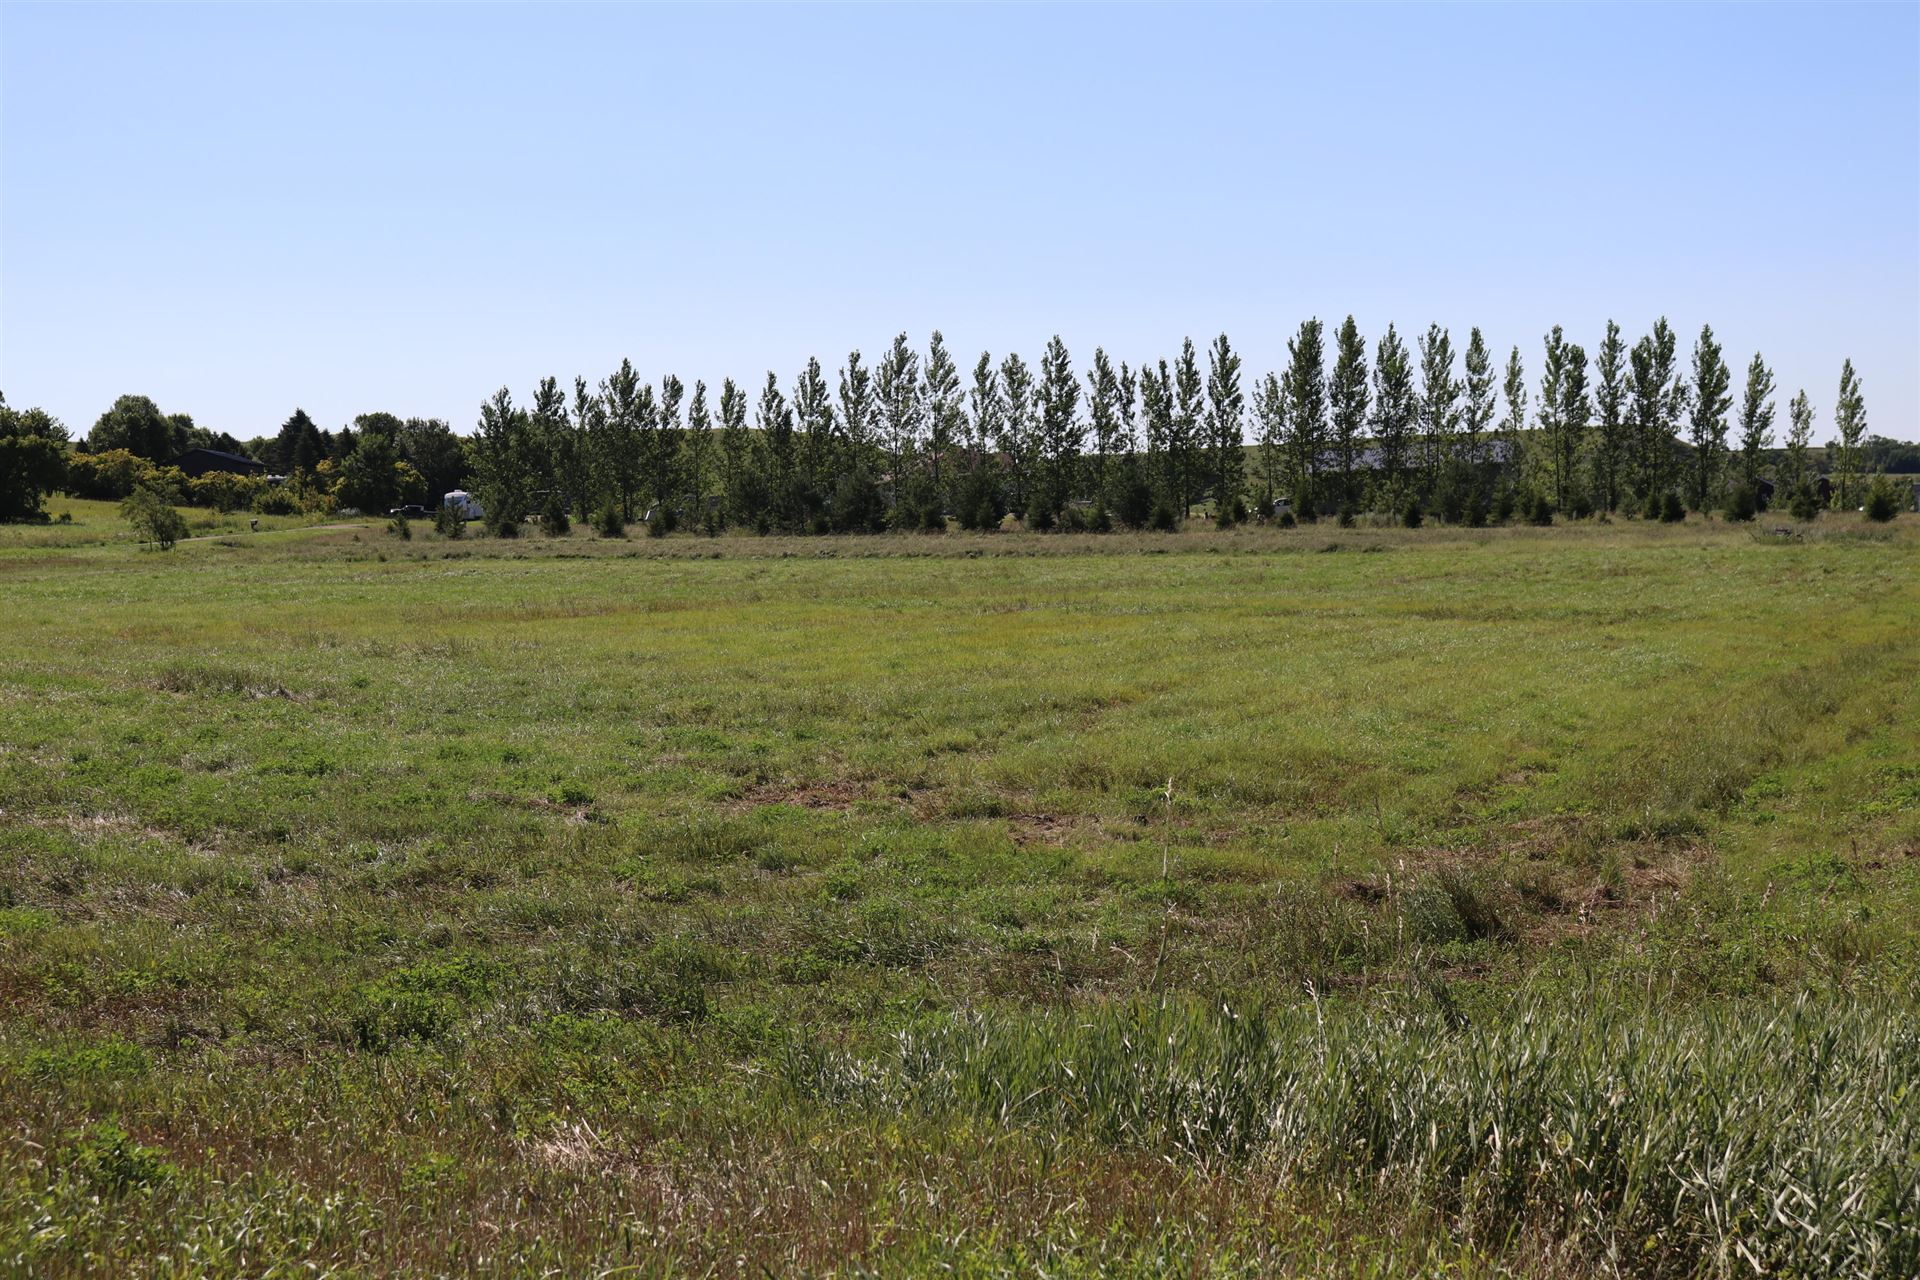 Photo for Lot 33 Sheyenne Valley Estates, Valley City, ND 58072 (MLS # 20-701)